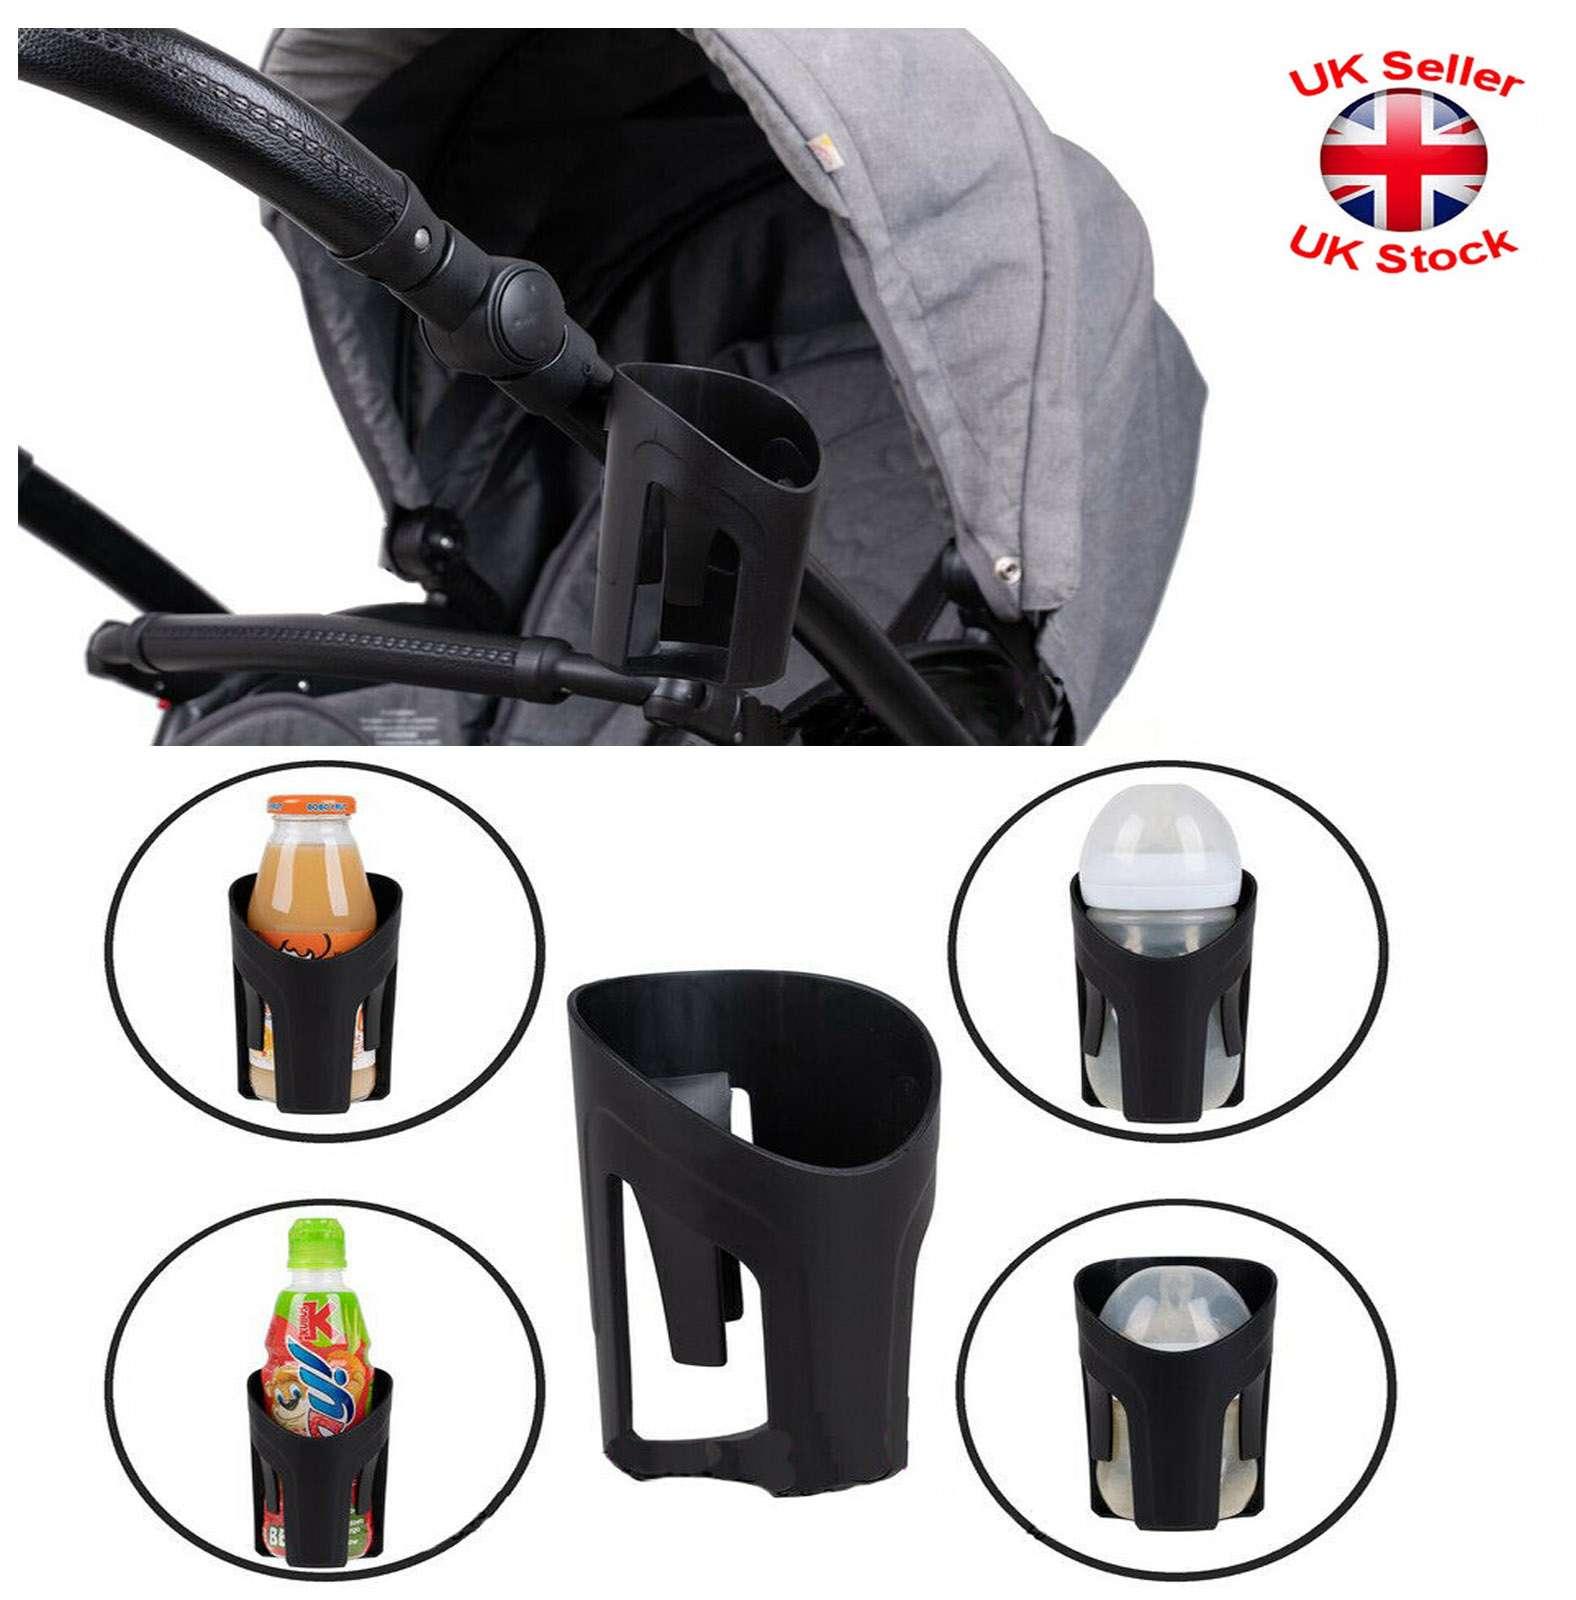 Universal Milk Drink Bottle Coffee Cup Holder for Baby Stroller Pram Bicycle UK!